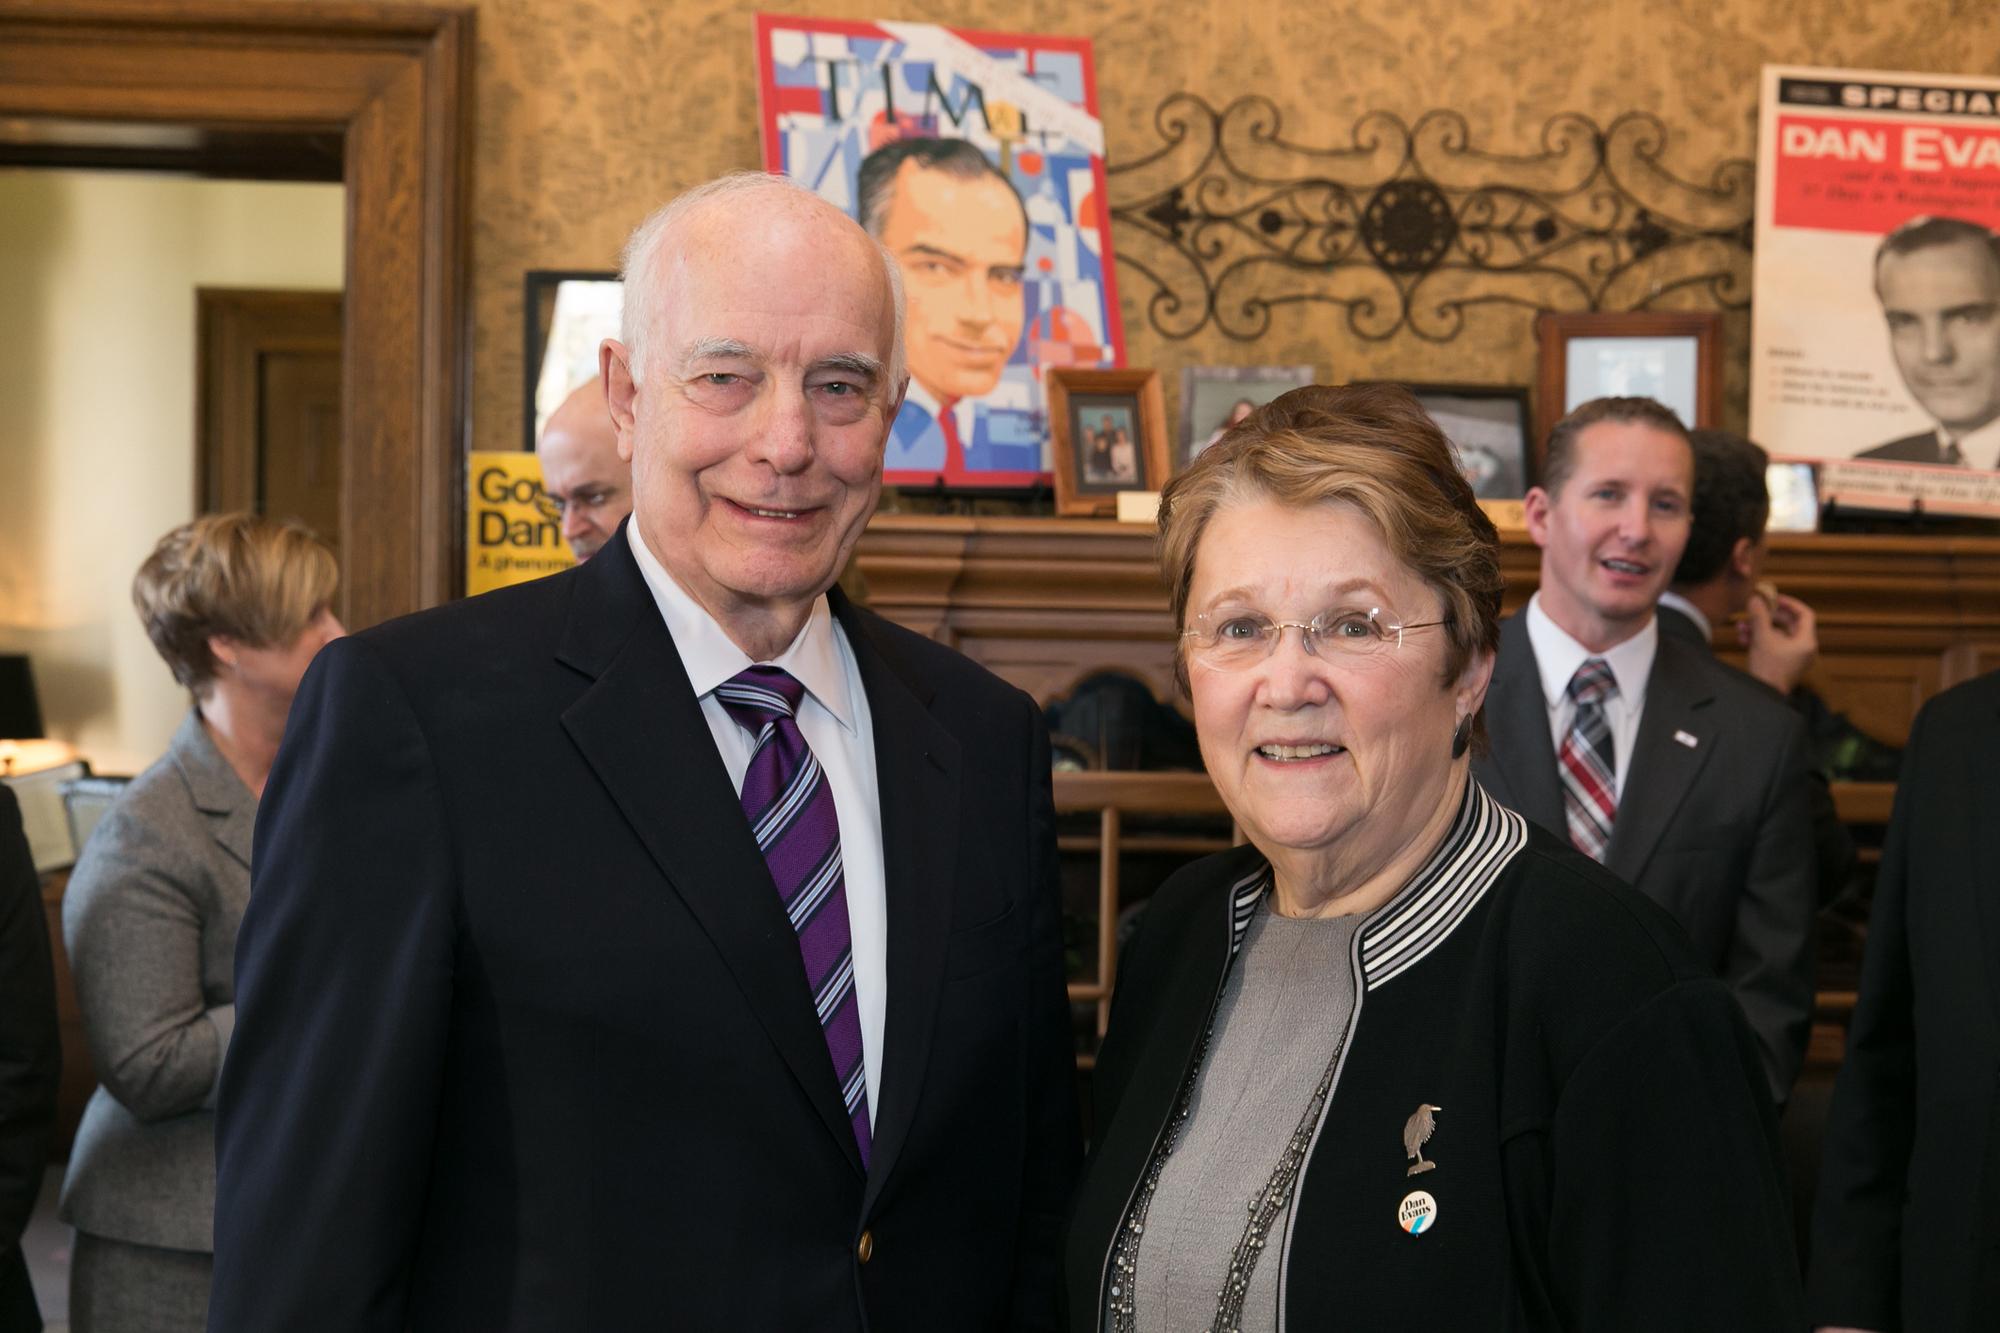 Gov. Evans and Sen. Fraser